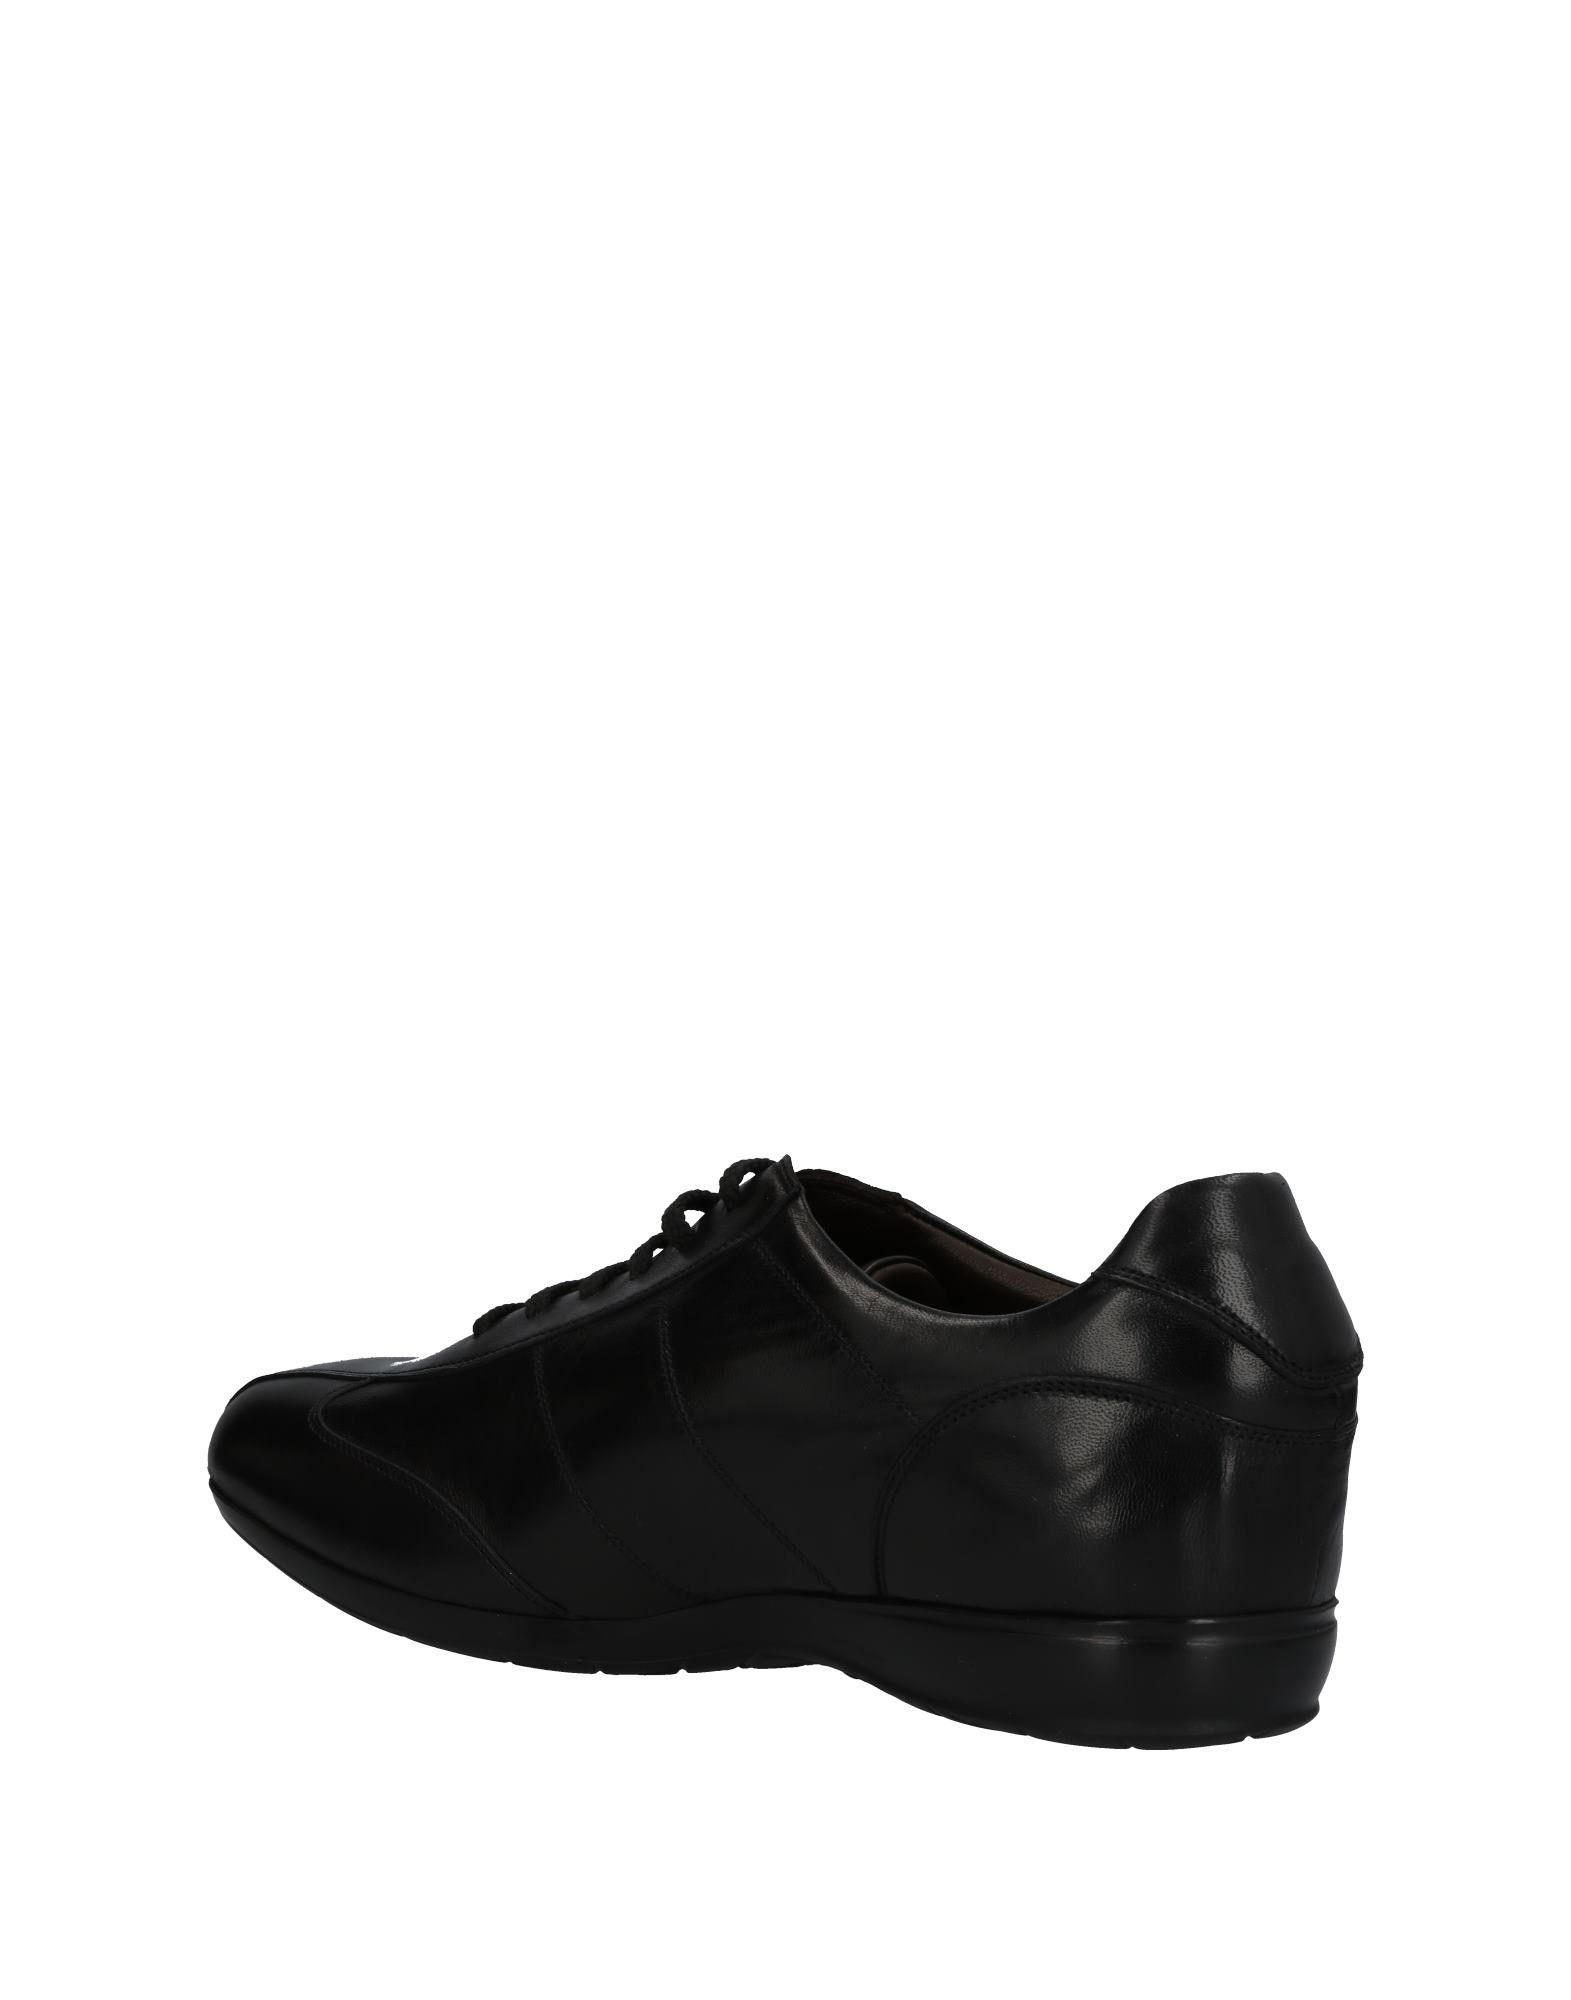 Rabatt echte Schuhe Herren Calpierre Sneakers Herren Schuhe  11462211WB 2f4199